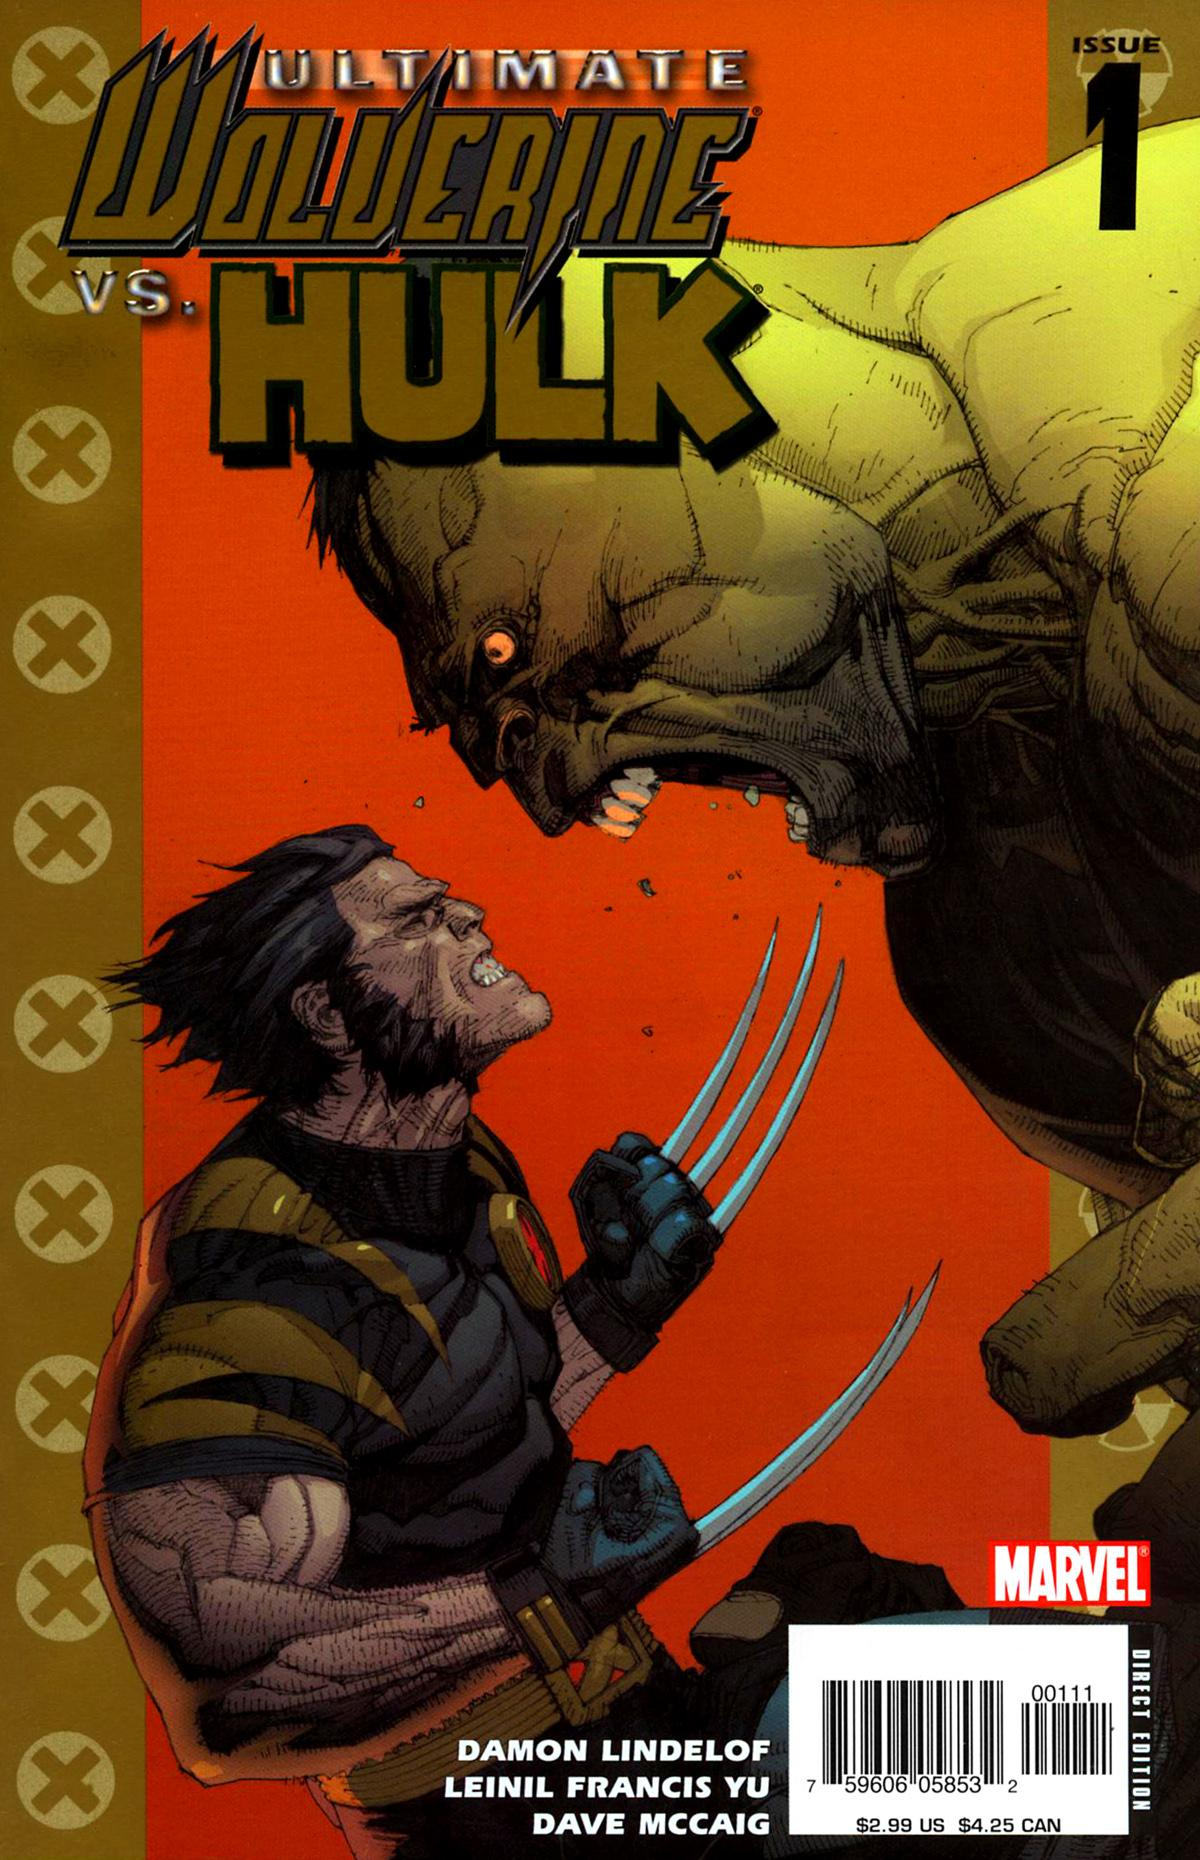 Hulk Fucks She Hulk Pretty ultimate wolverine vs. hulk [review]   the wolfman cometh